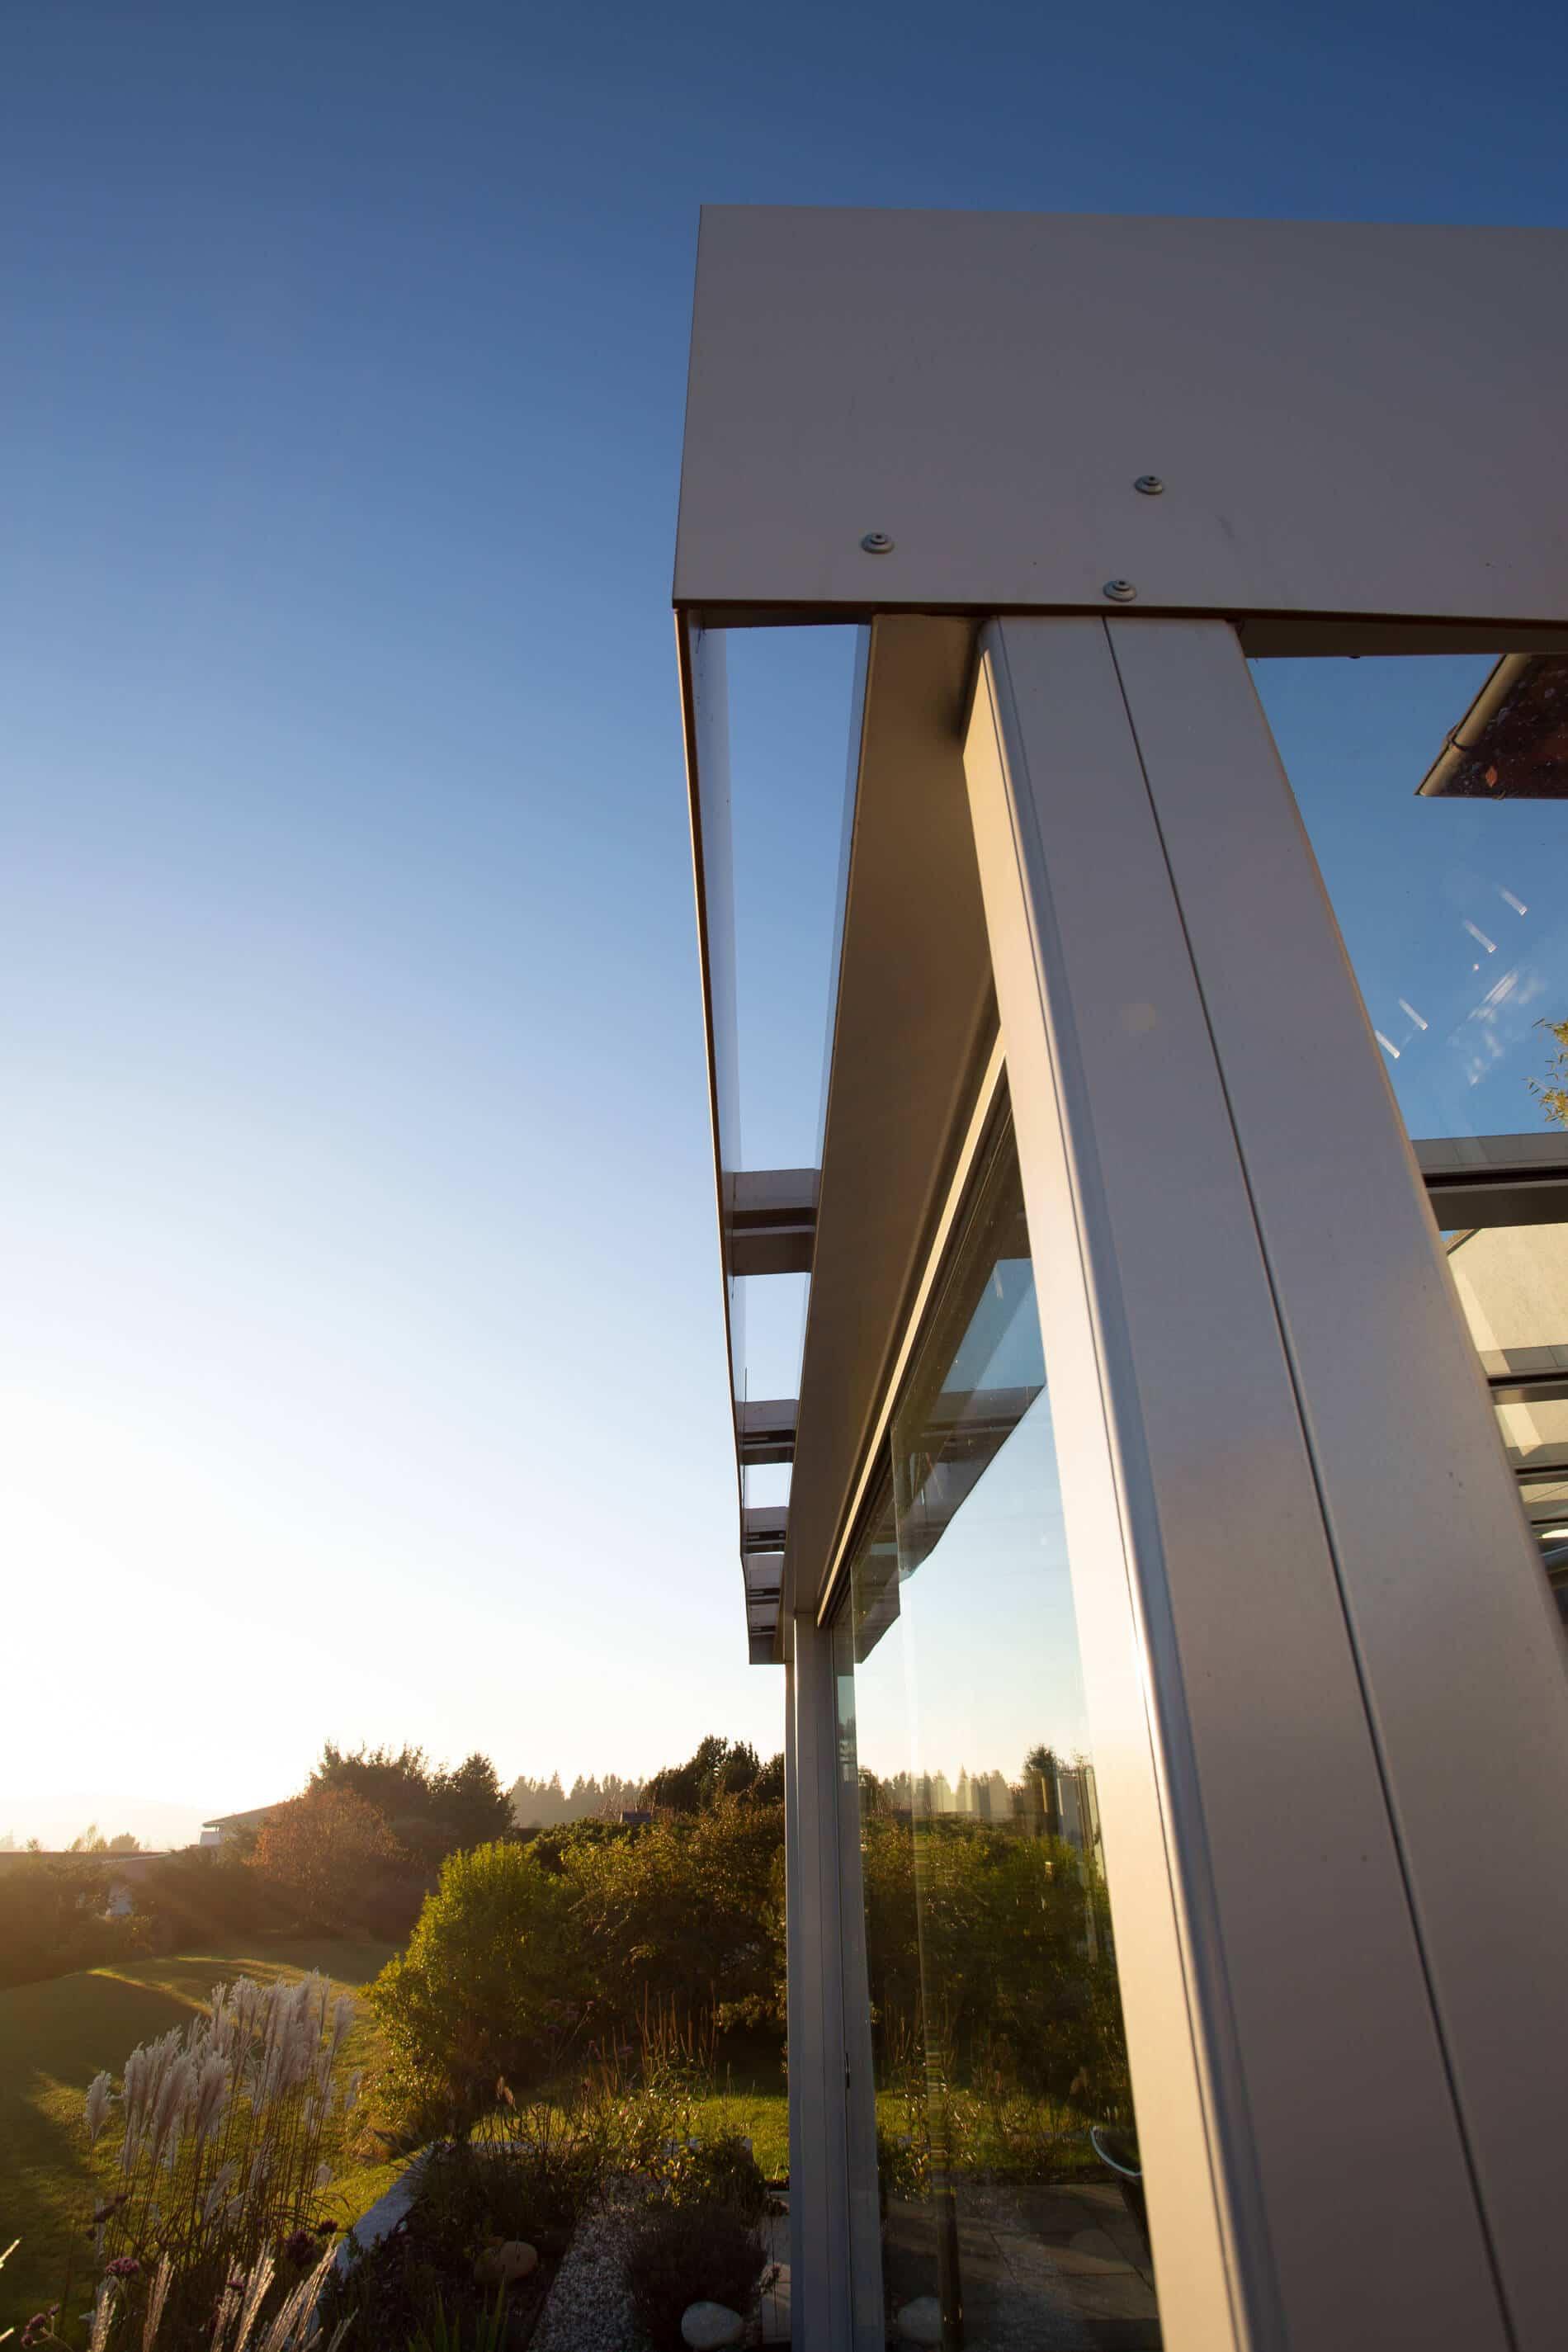 windschutz mit festem dach fenster schmidinger. Black Bedroom Furniture Sets. Home Design Ideas